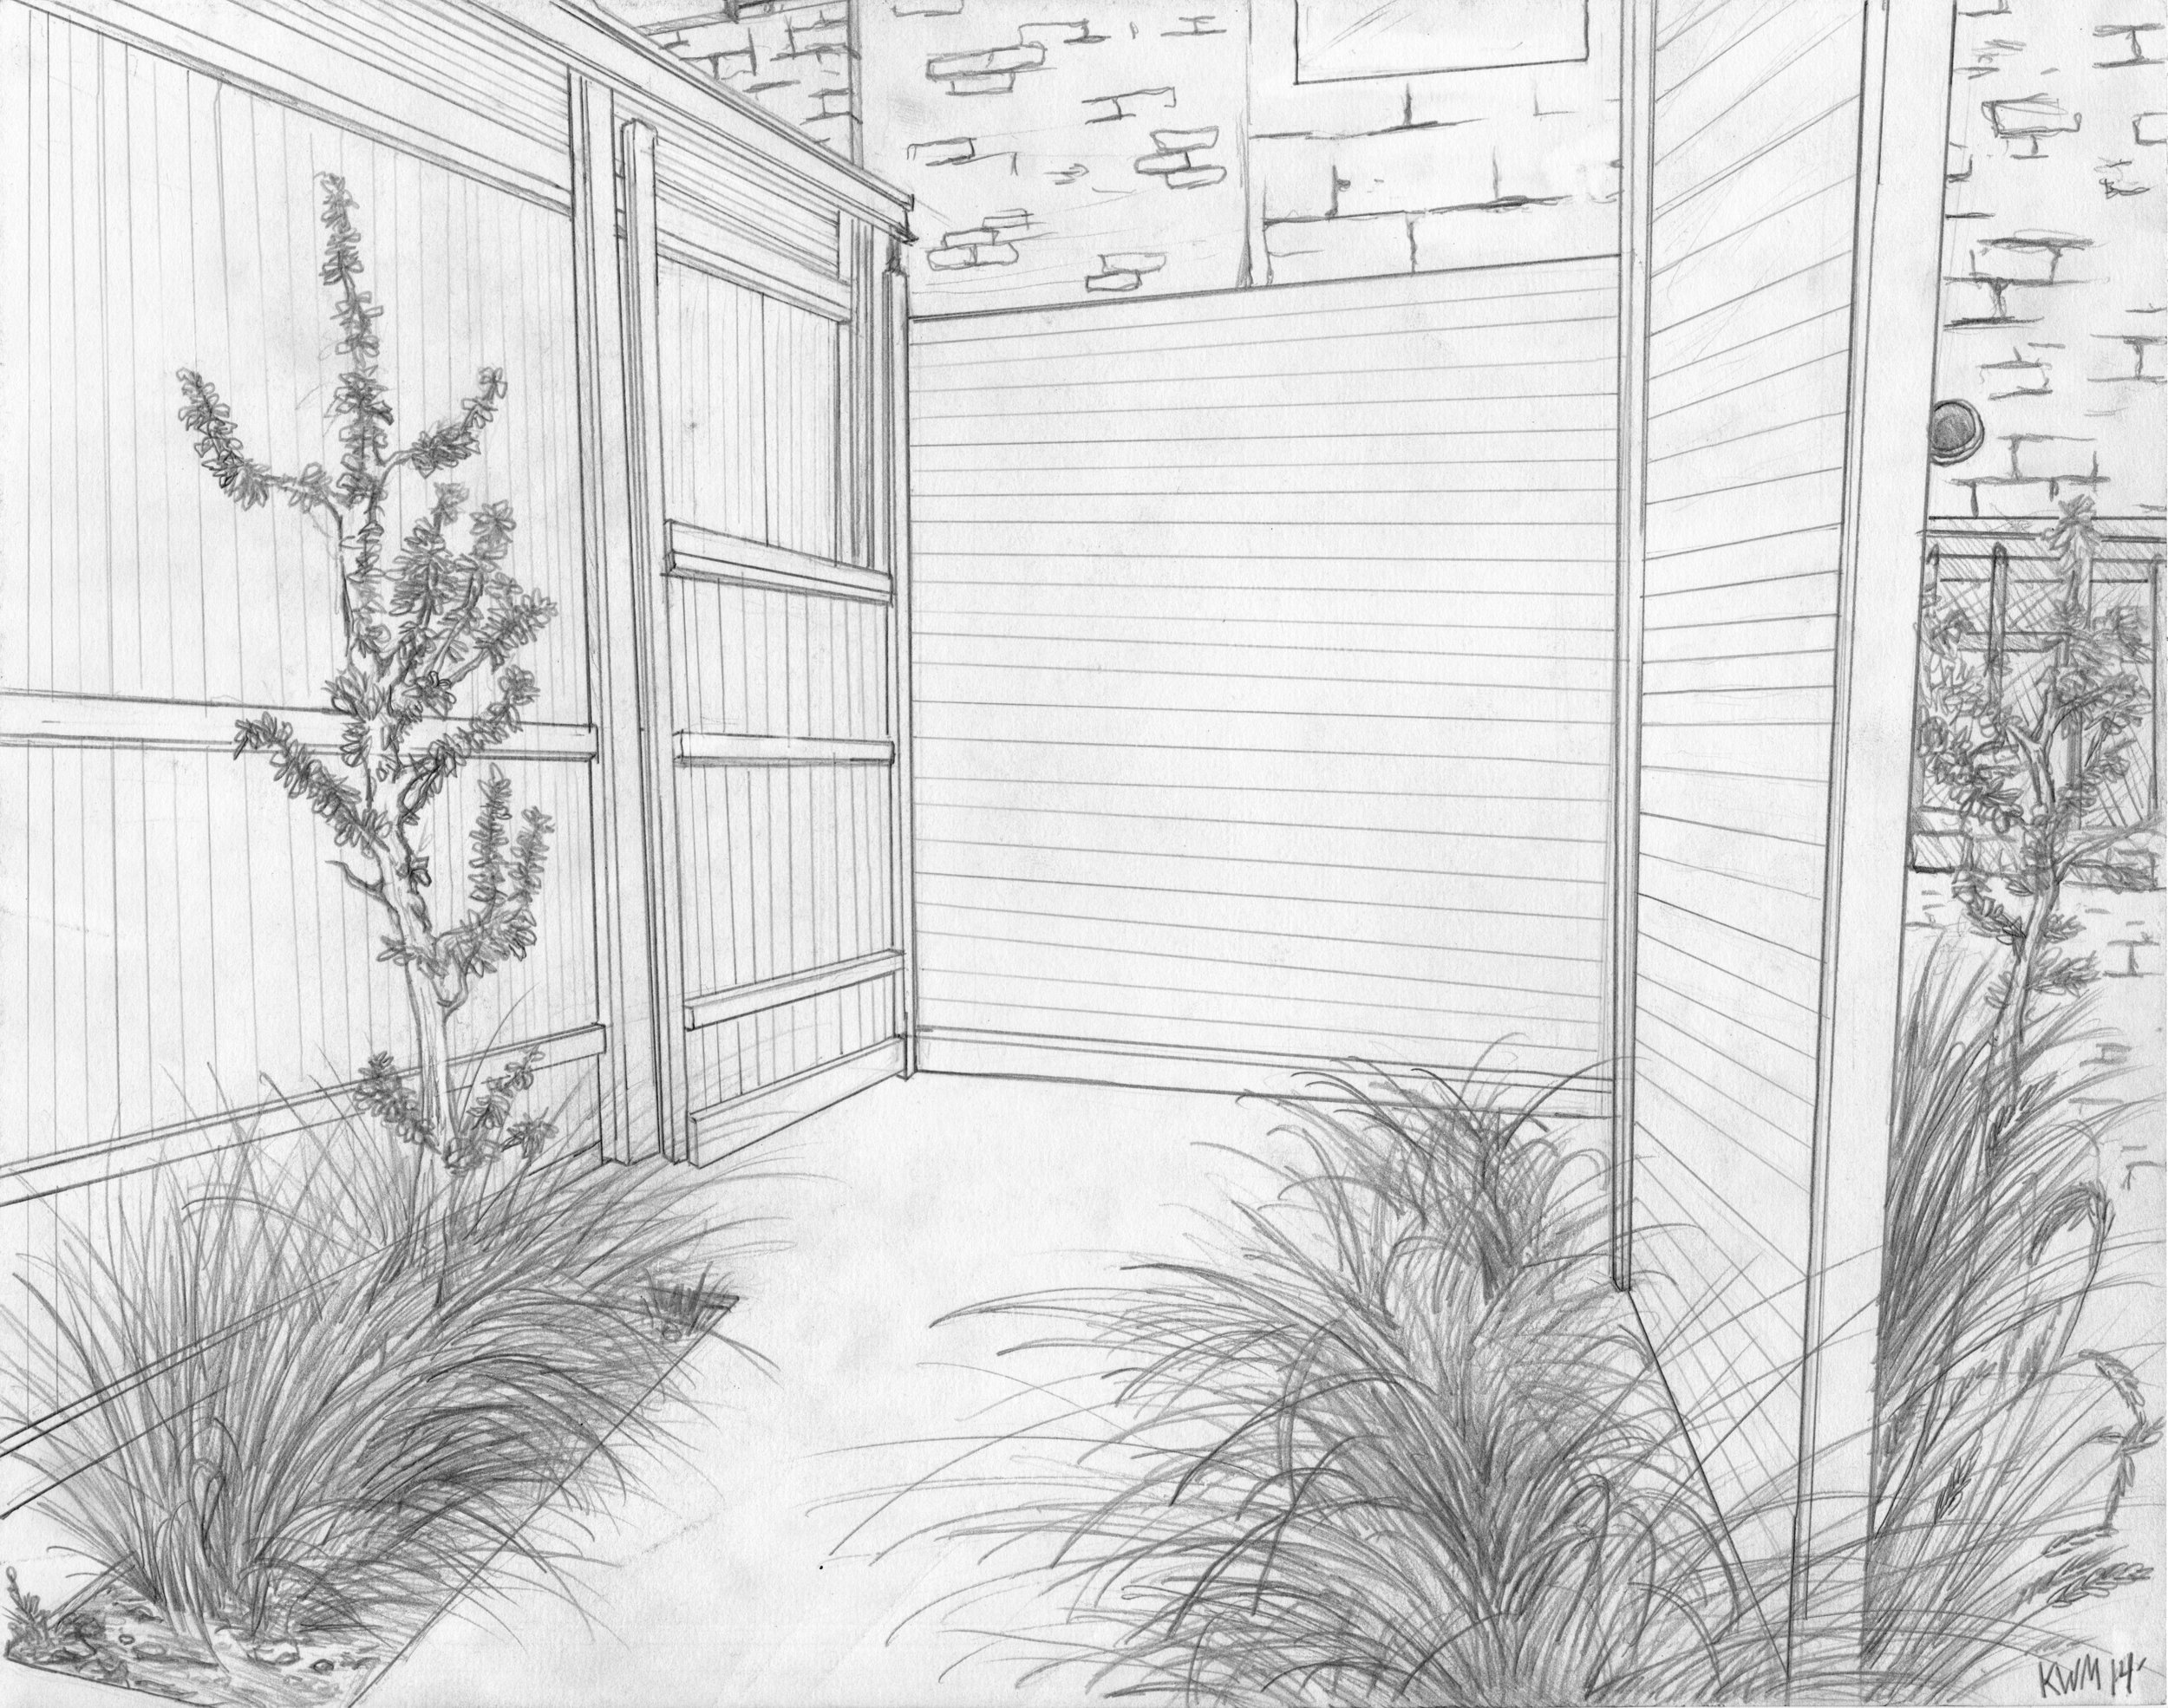 garden sketch 3.jpg